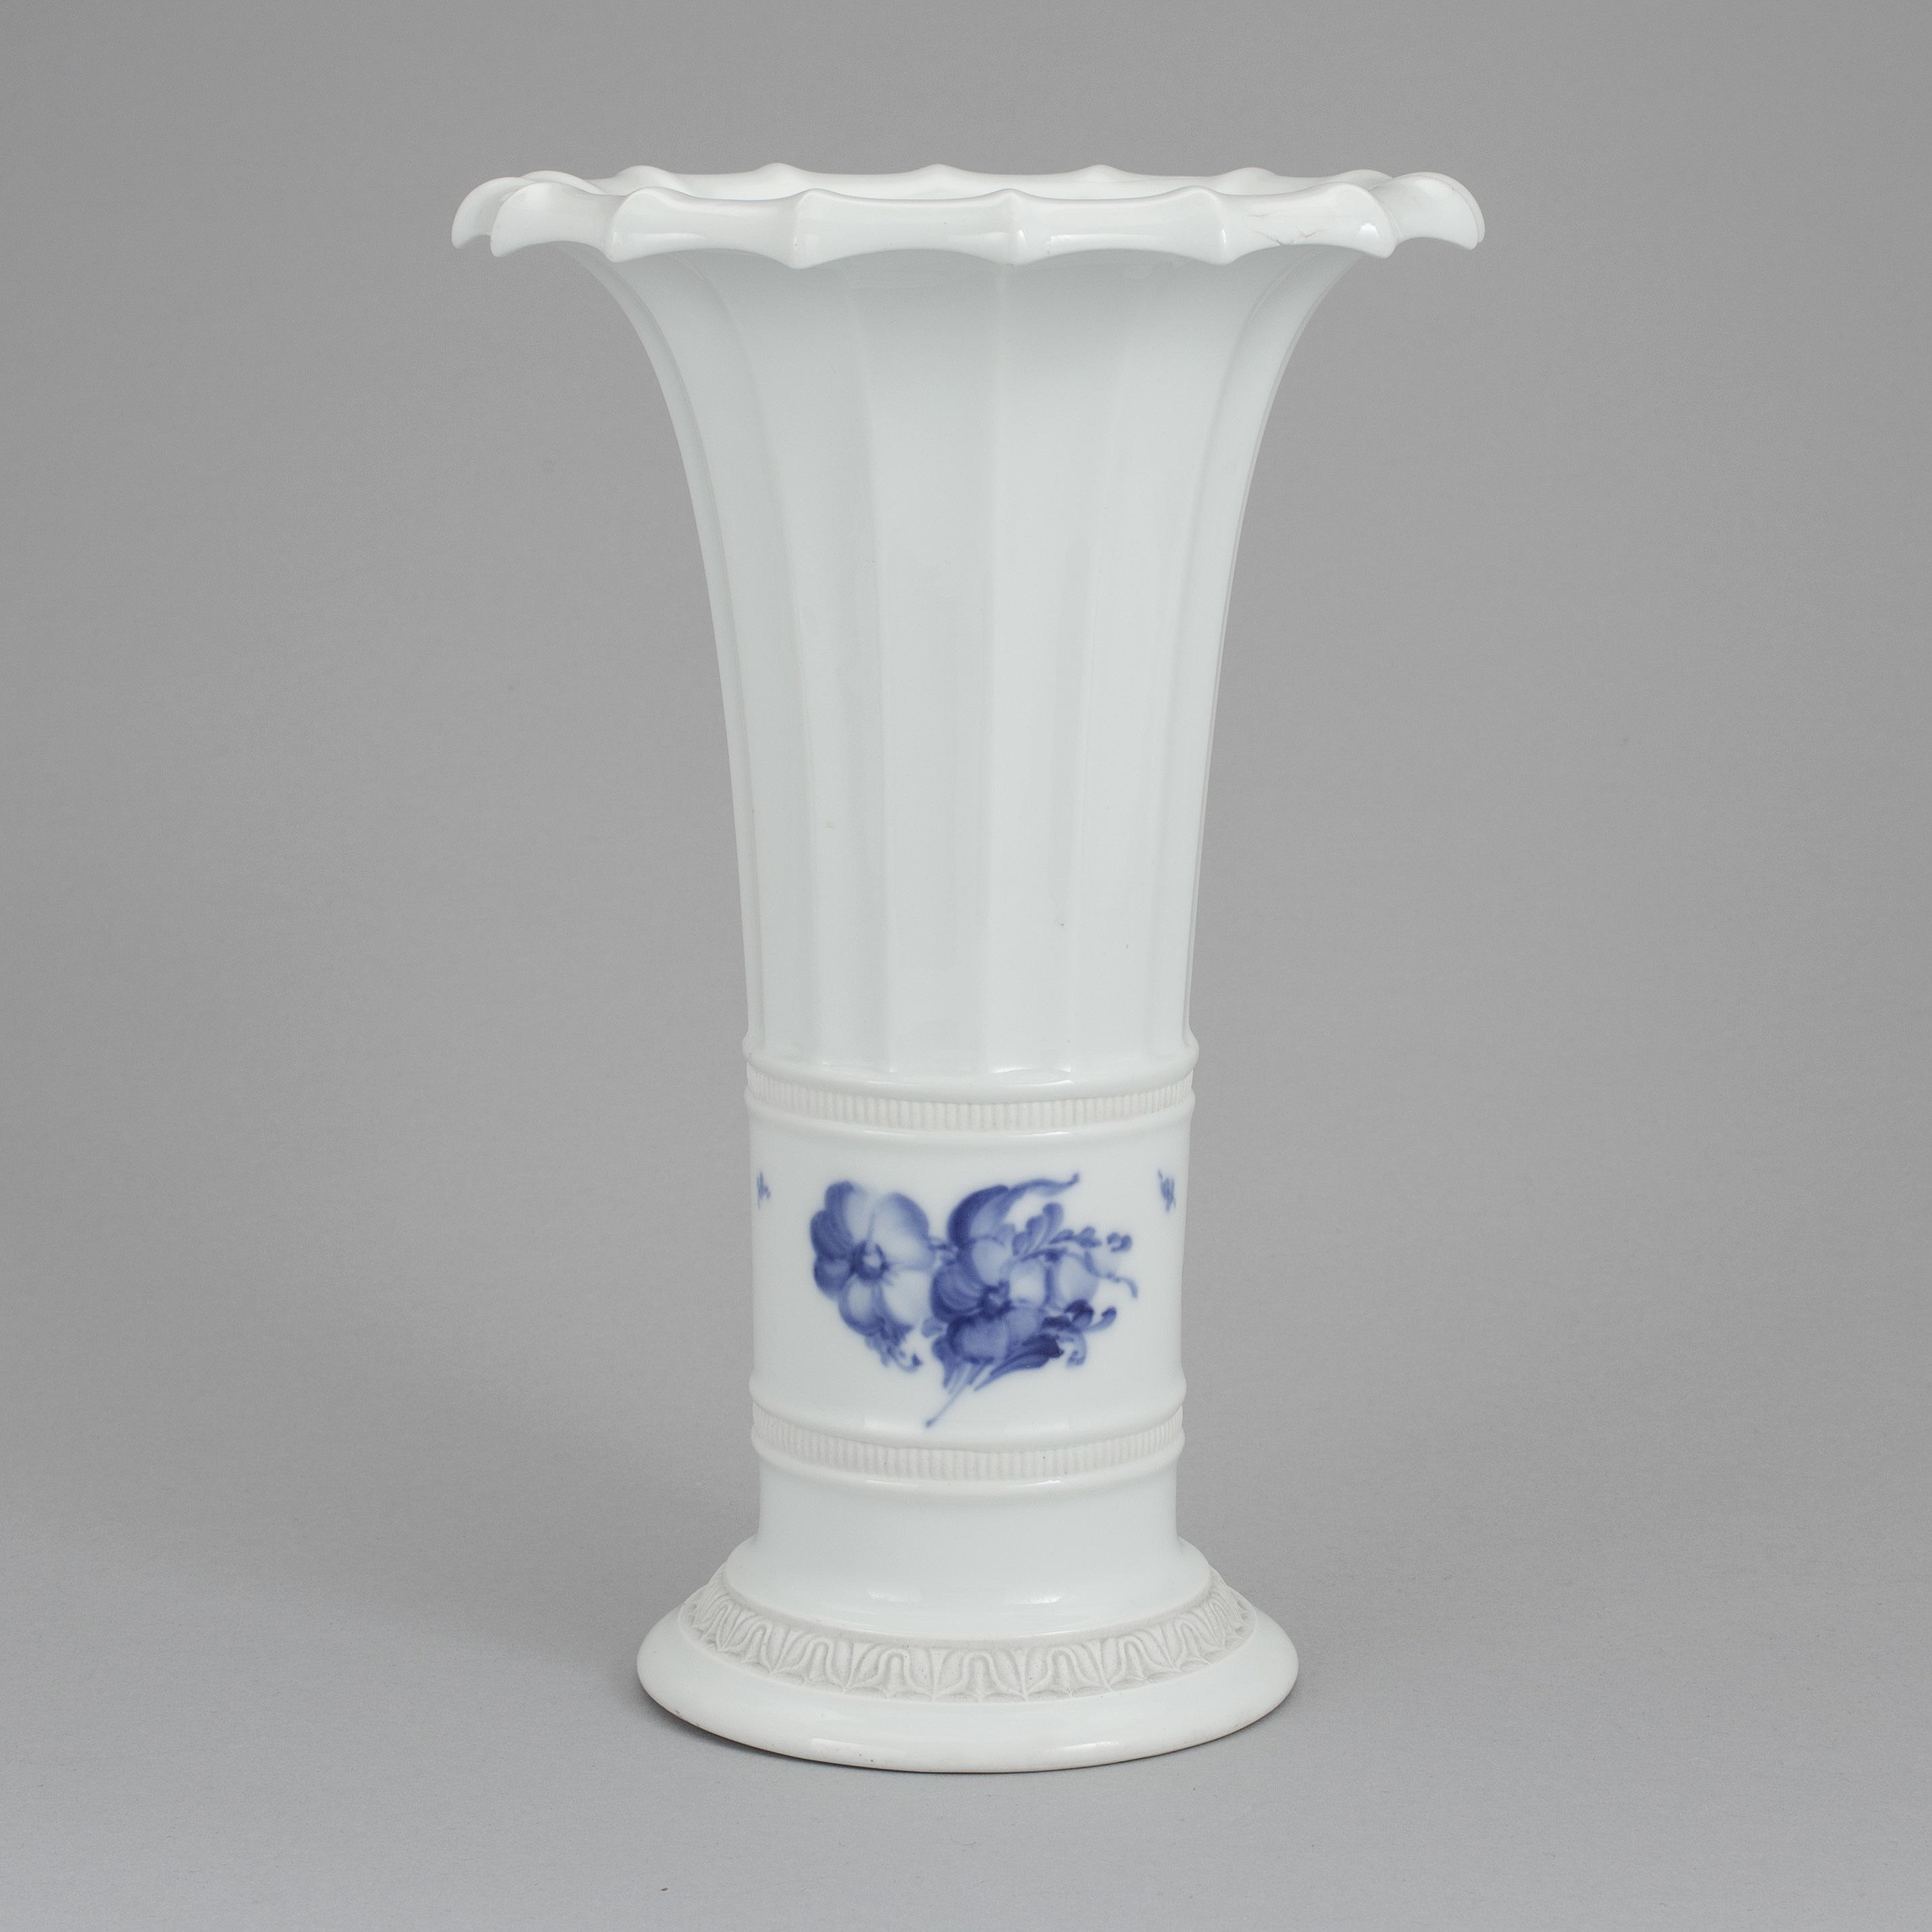 Royal copenhagen a fluted trumpet vase 8569 from royal copenhagen 10059275 bukobject reviewsmspy